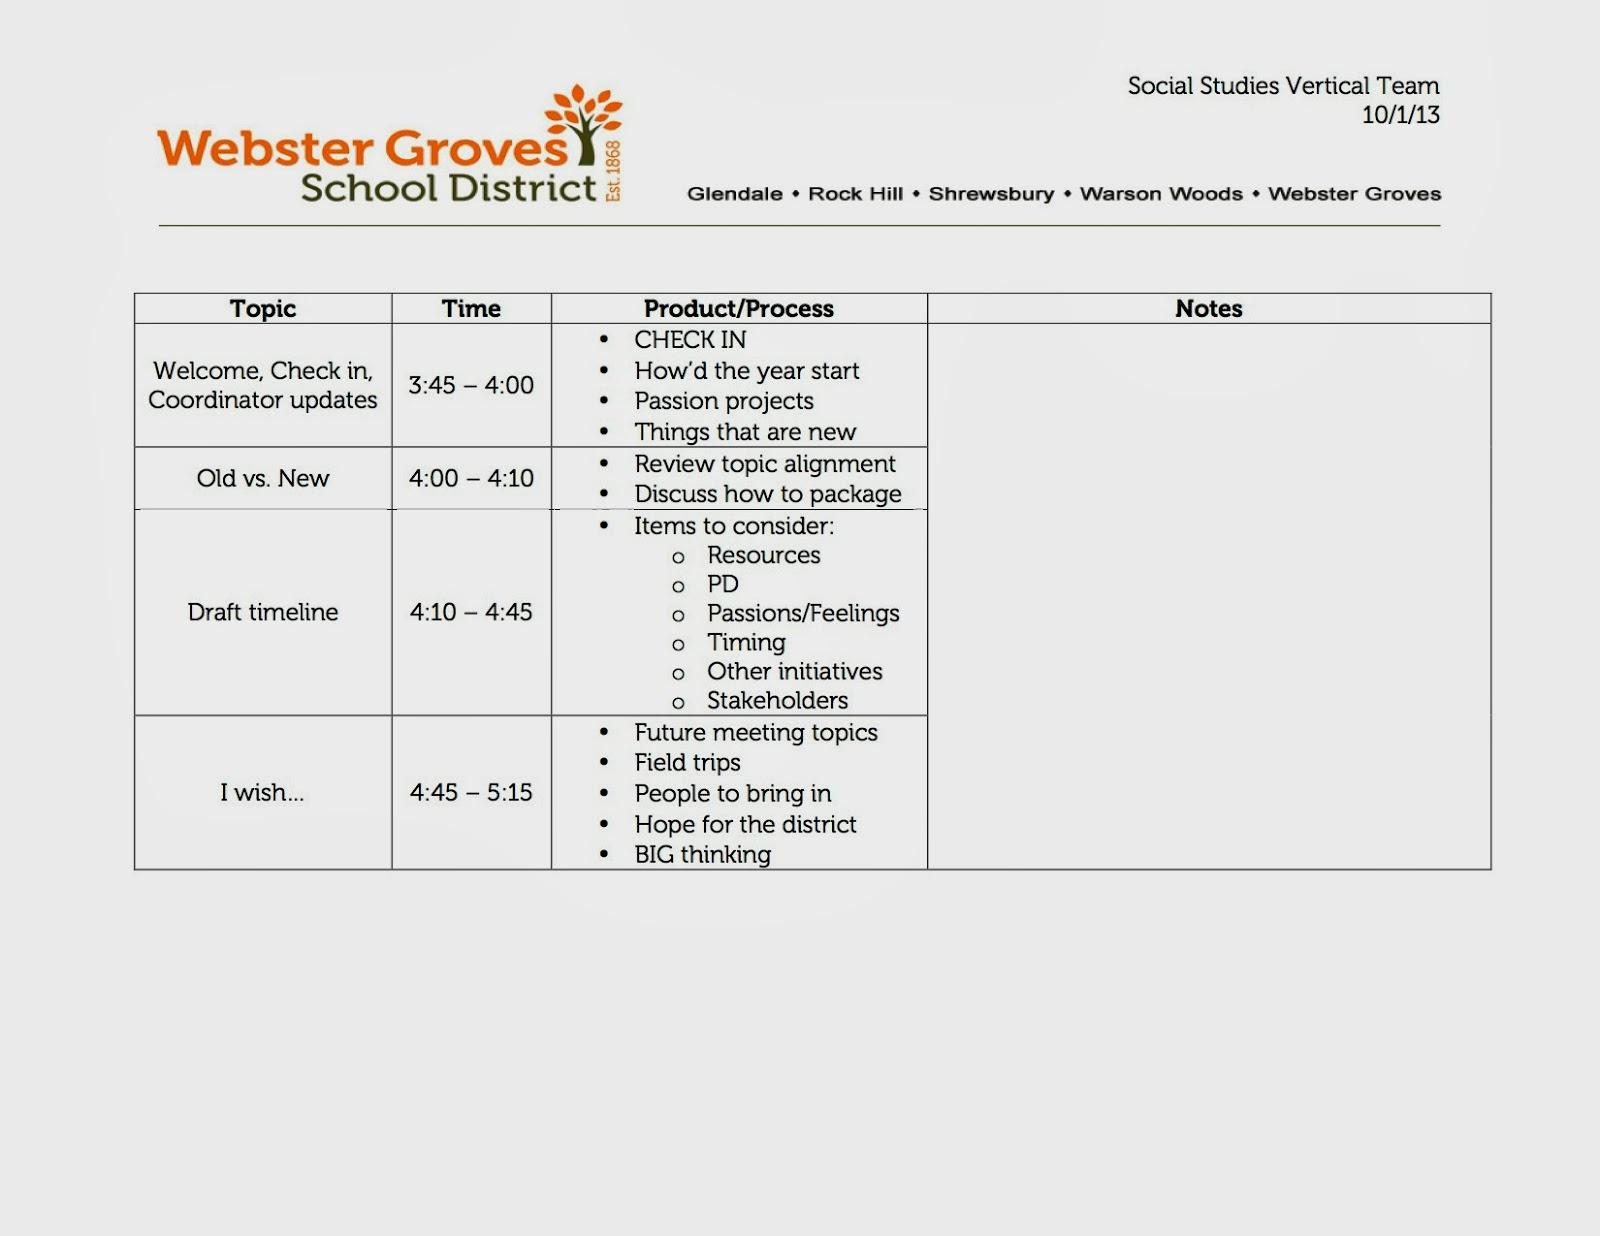 School Team Meeting Agenda Template Facilitated vertical team